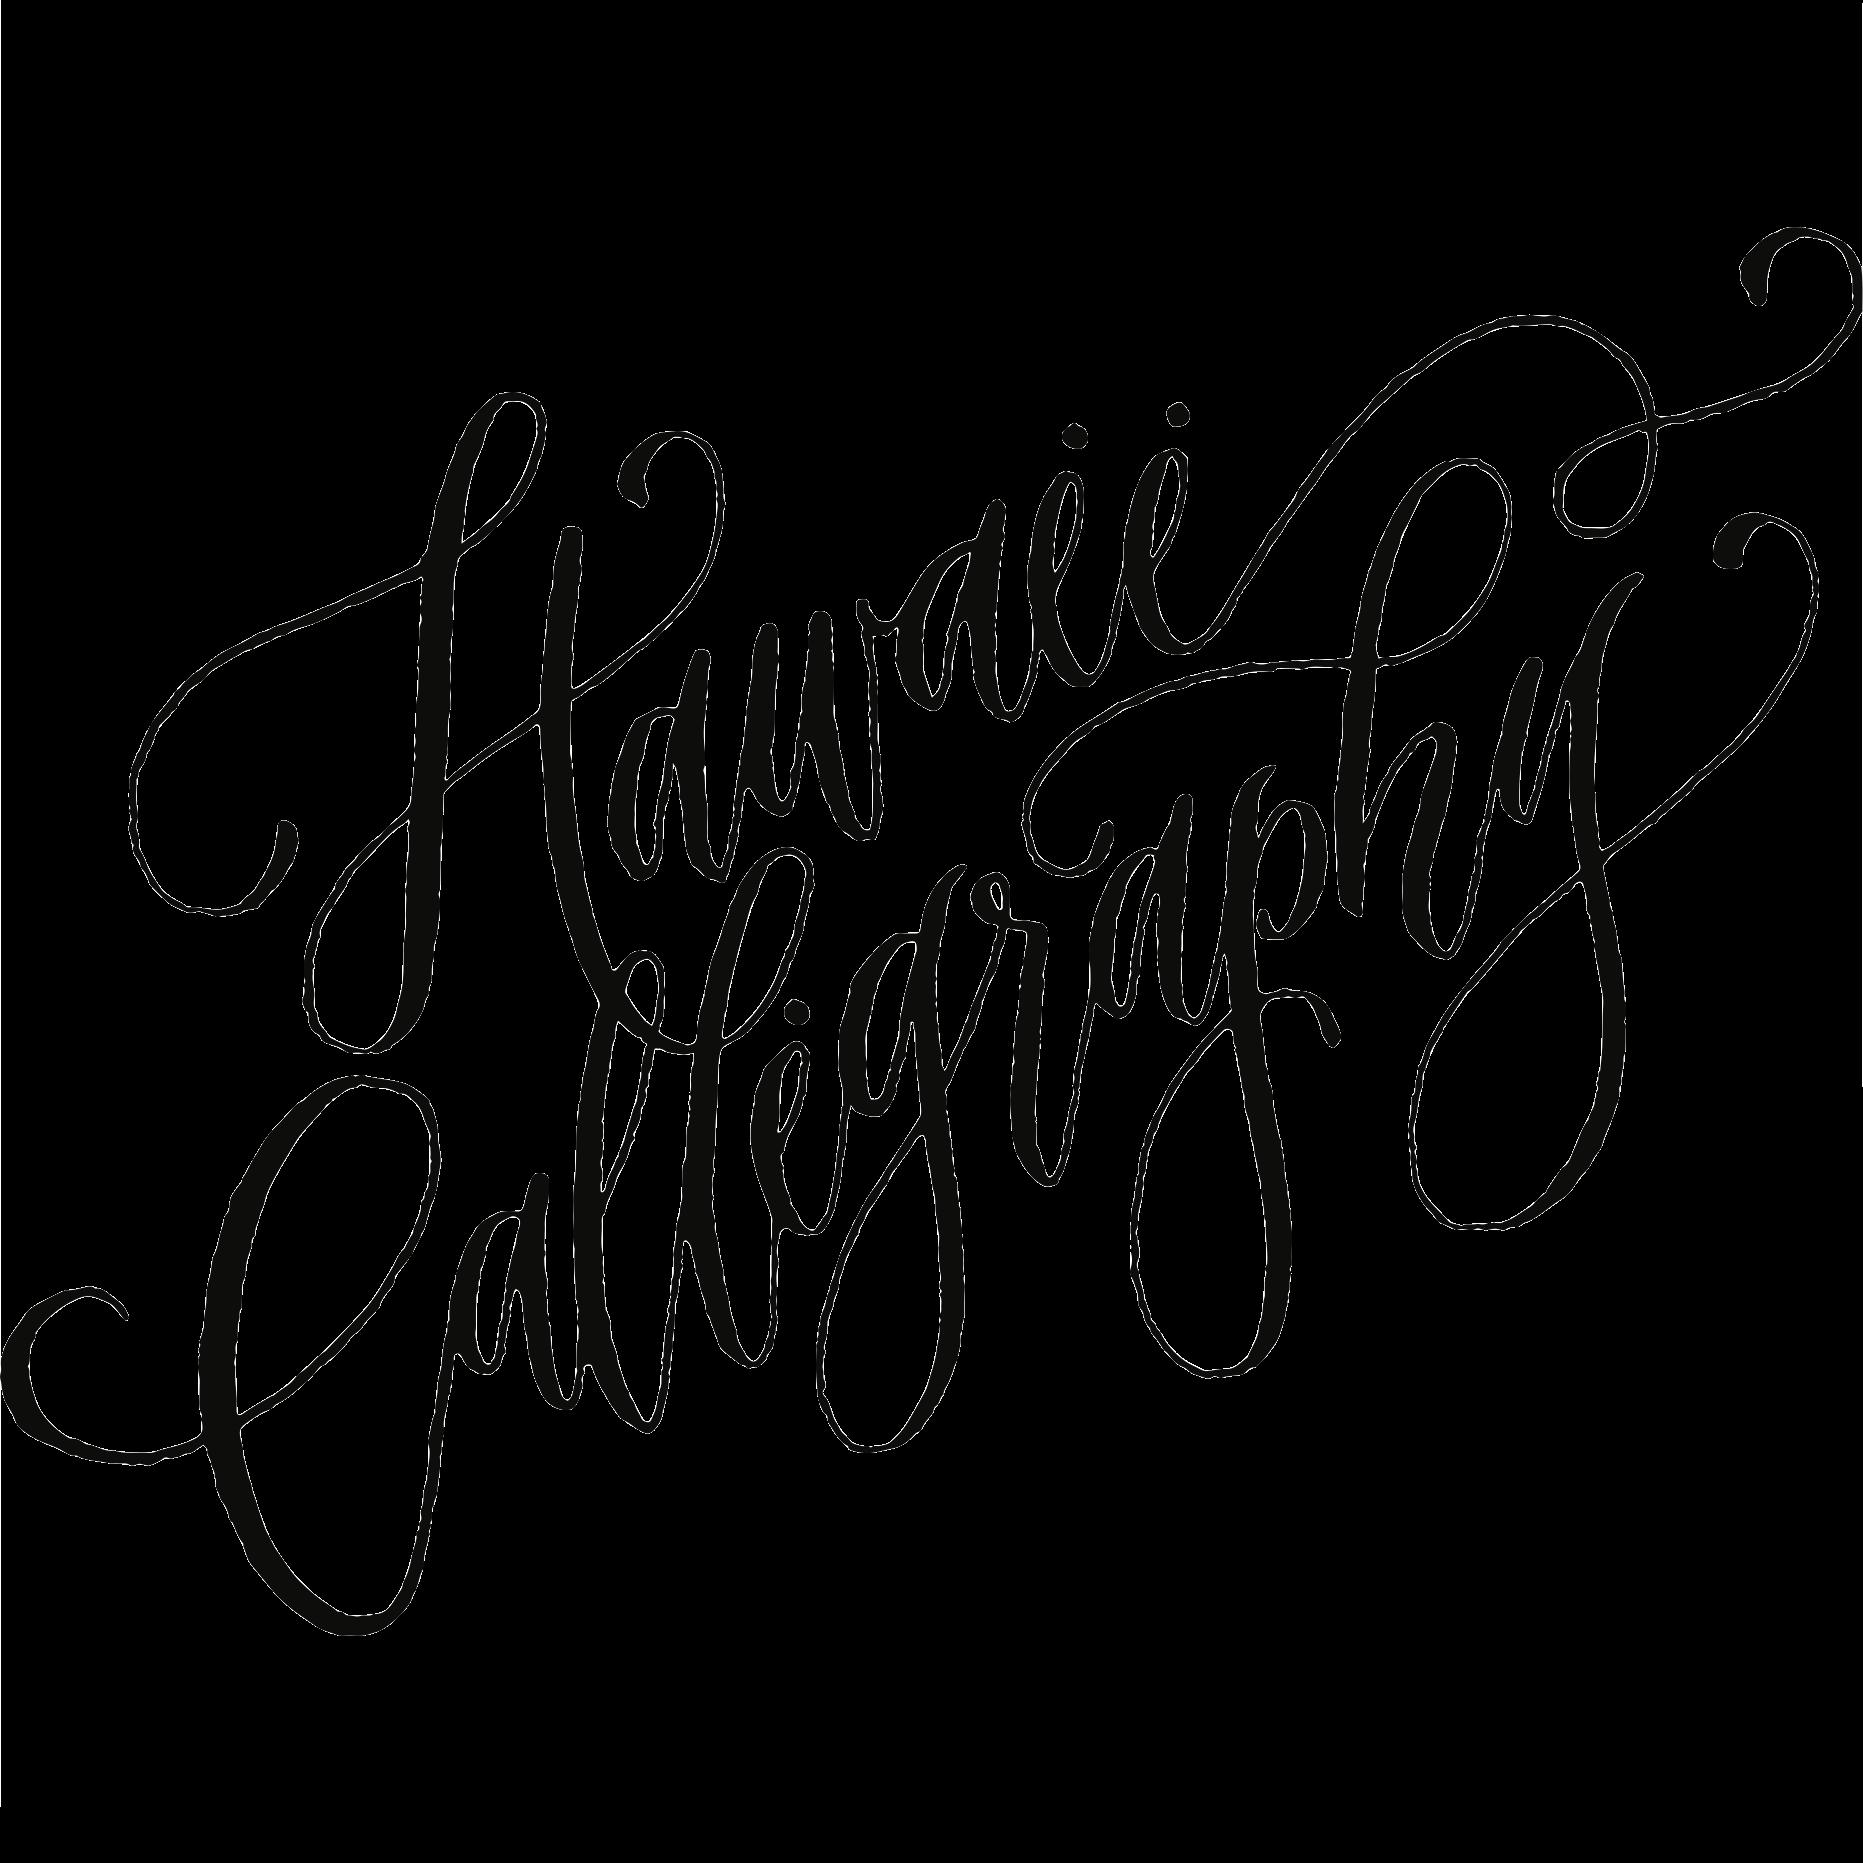 Calligraphy HD wallpapers, Desktop wallpaper - most viewed